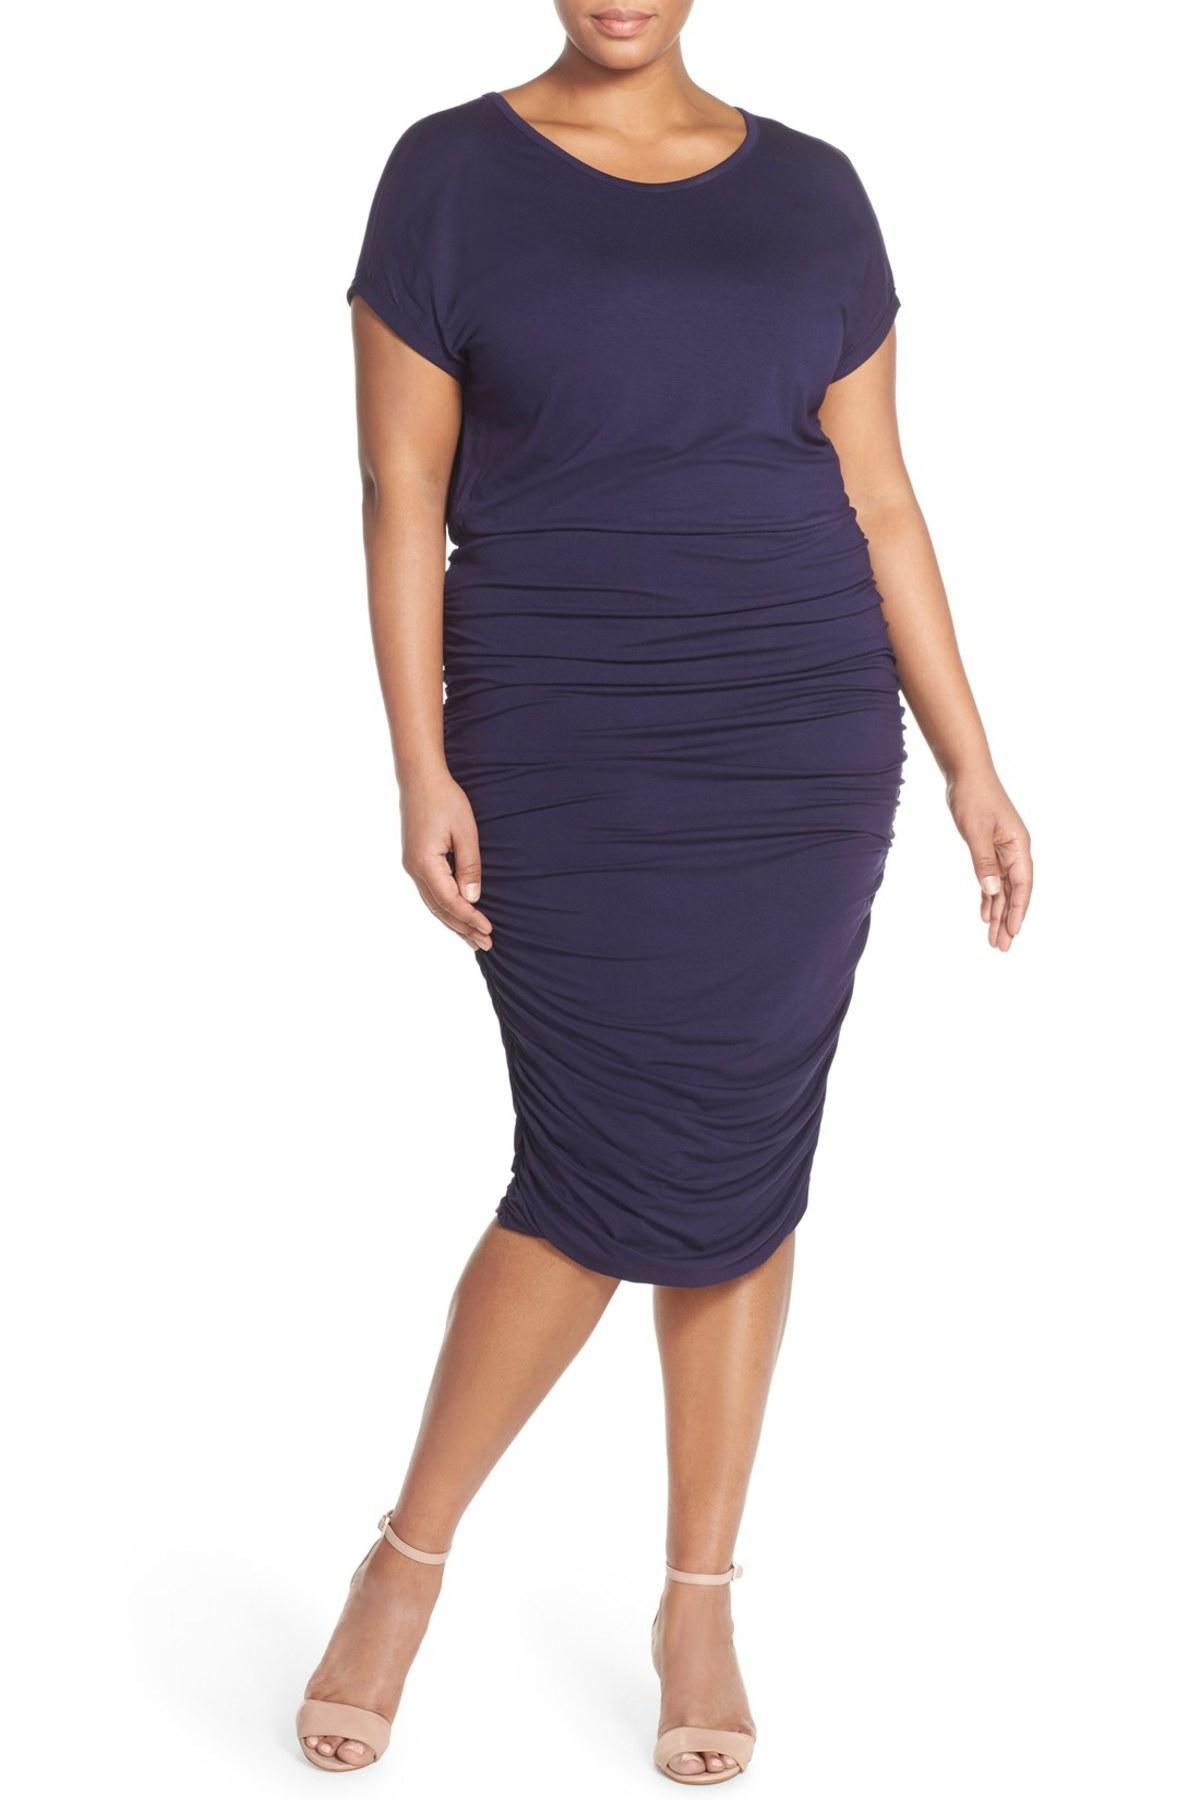 Plus Size Evening Dress Nordstrom – DACC